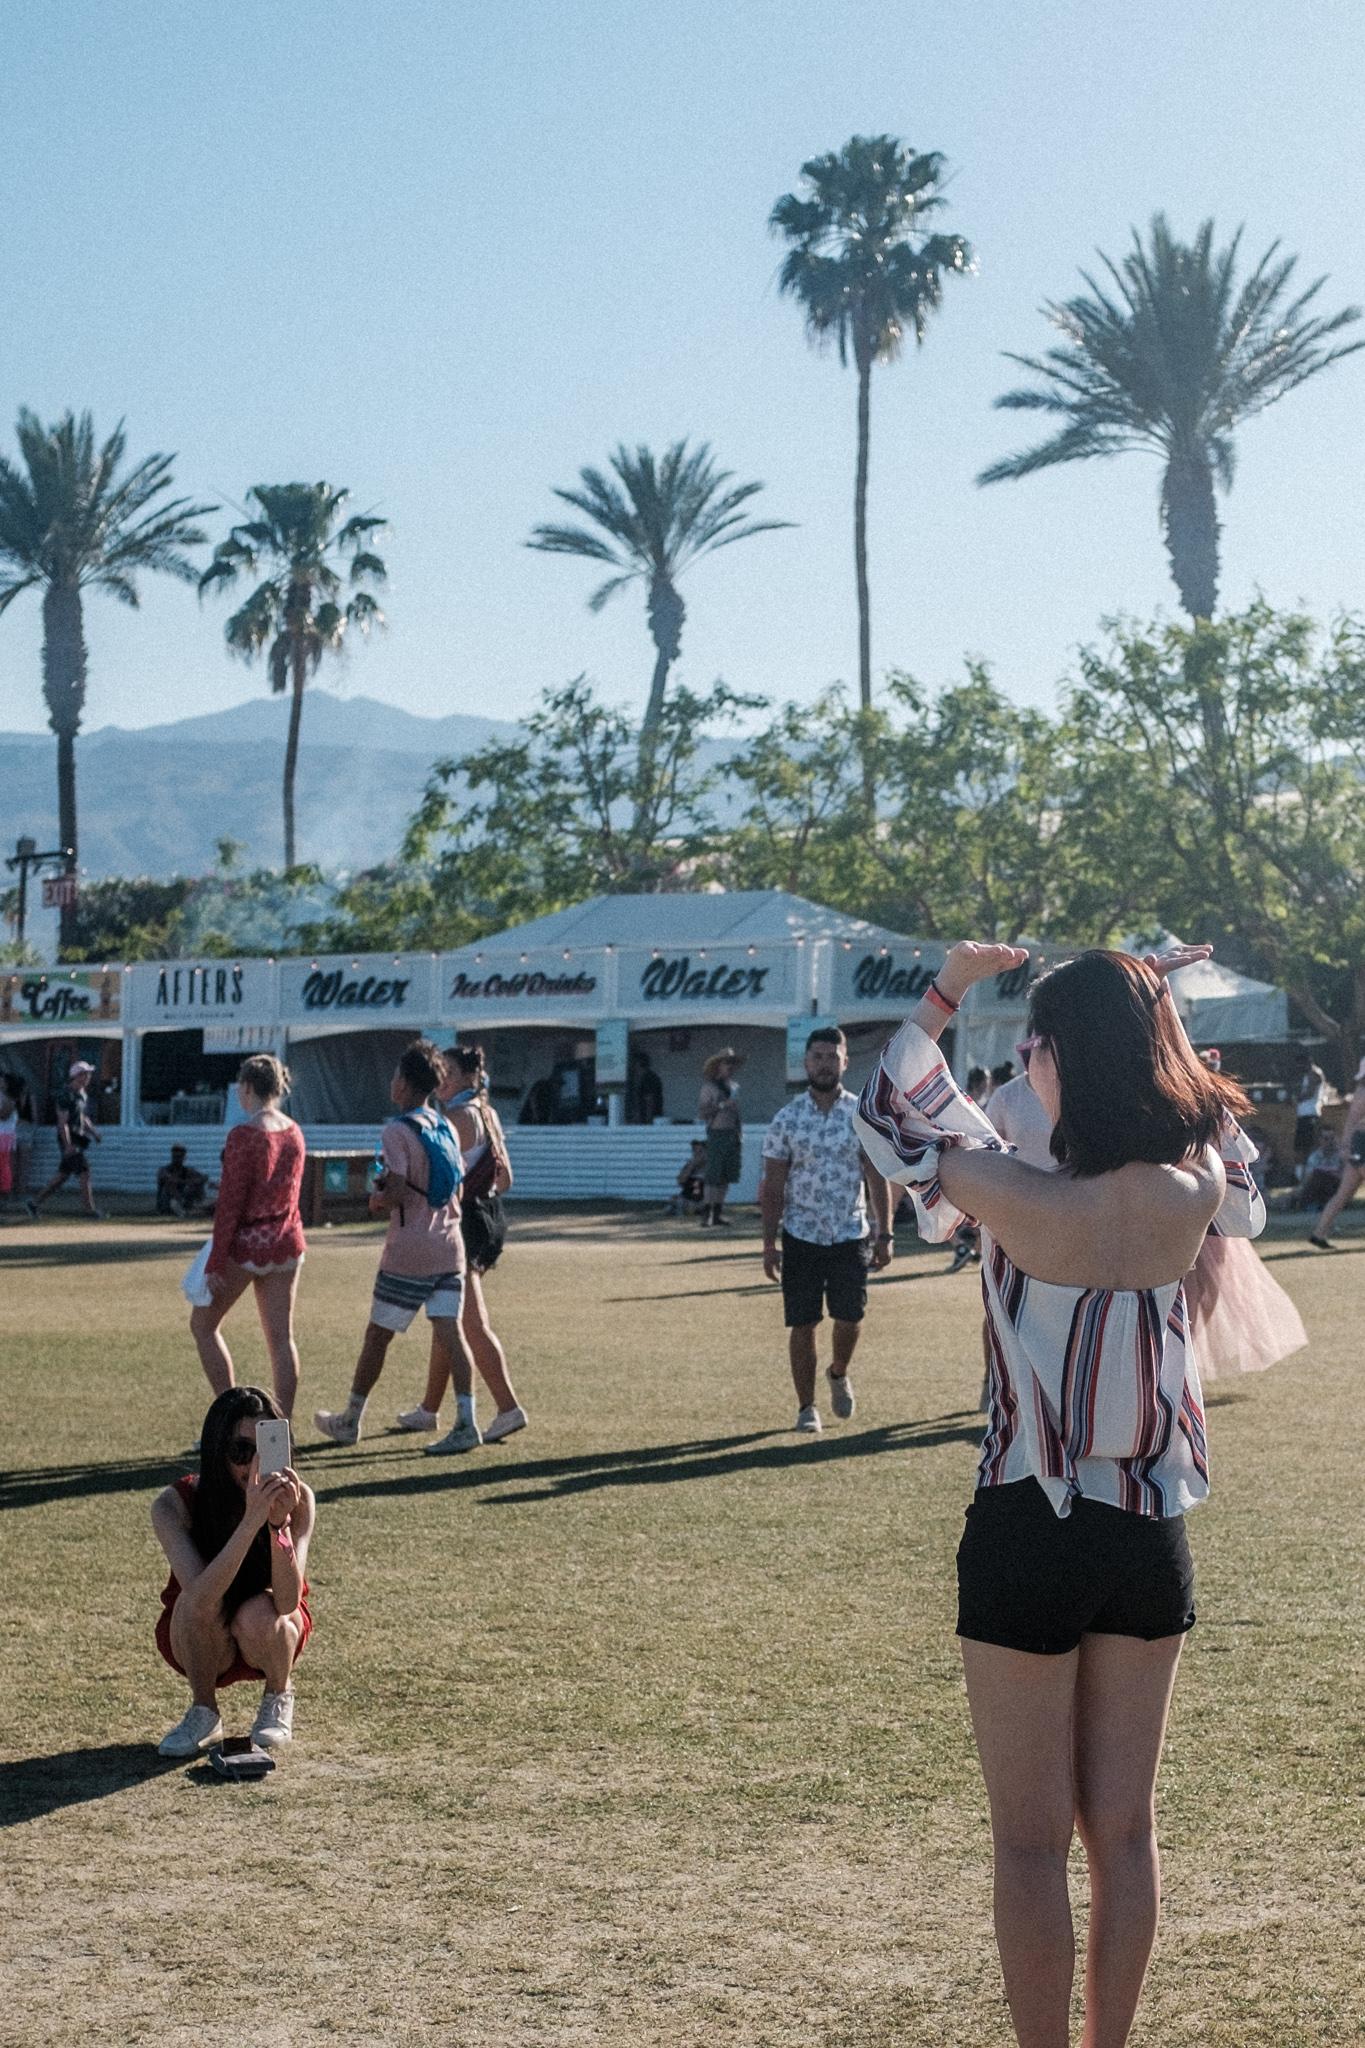 170422 Coachella 17 w2 1745.jpg